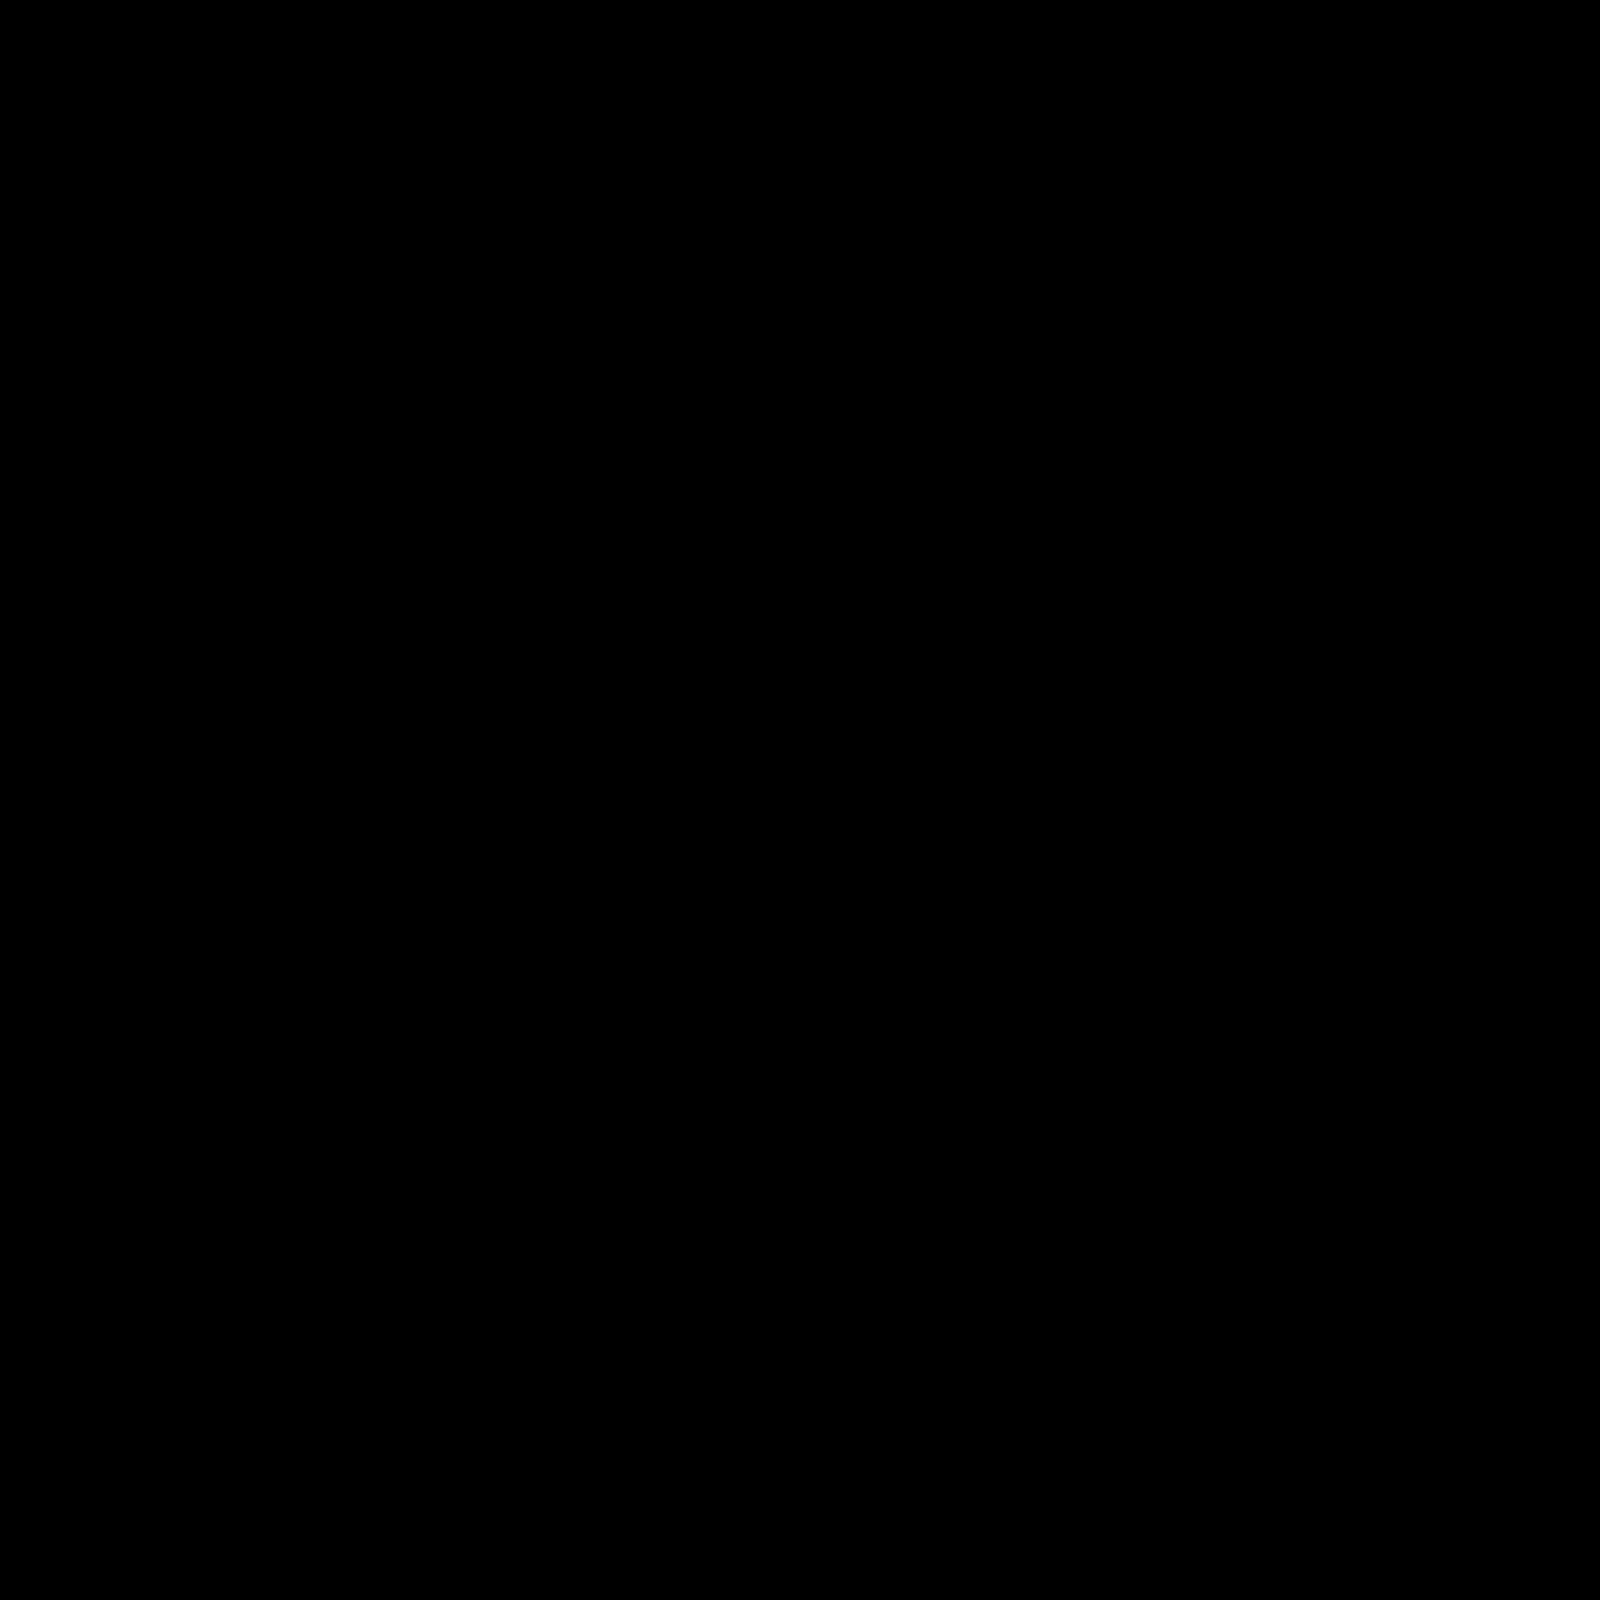 Adidas Trefoil icon